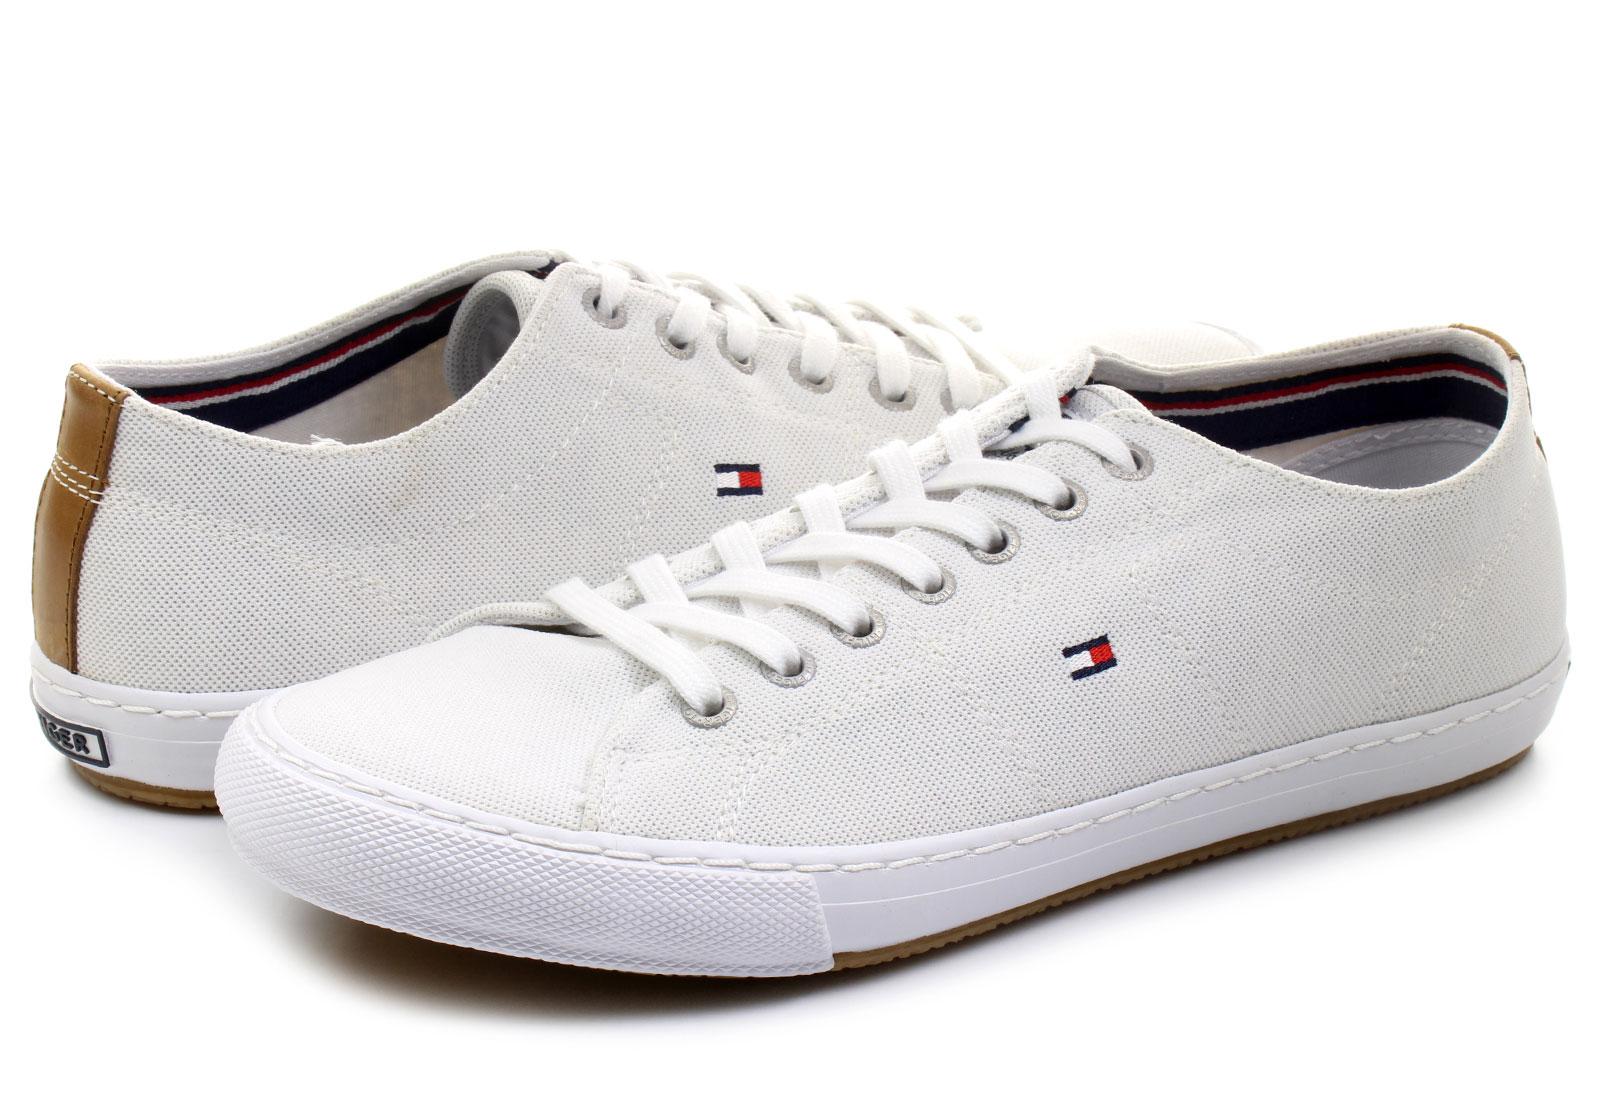 tommy hilfiger shoes walker 7d 16s 0981 100 online shop for sneakers shoes and boots. Black Bedroom Furniture Sets. Home Design Ideas